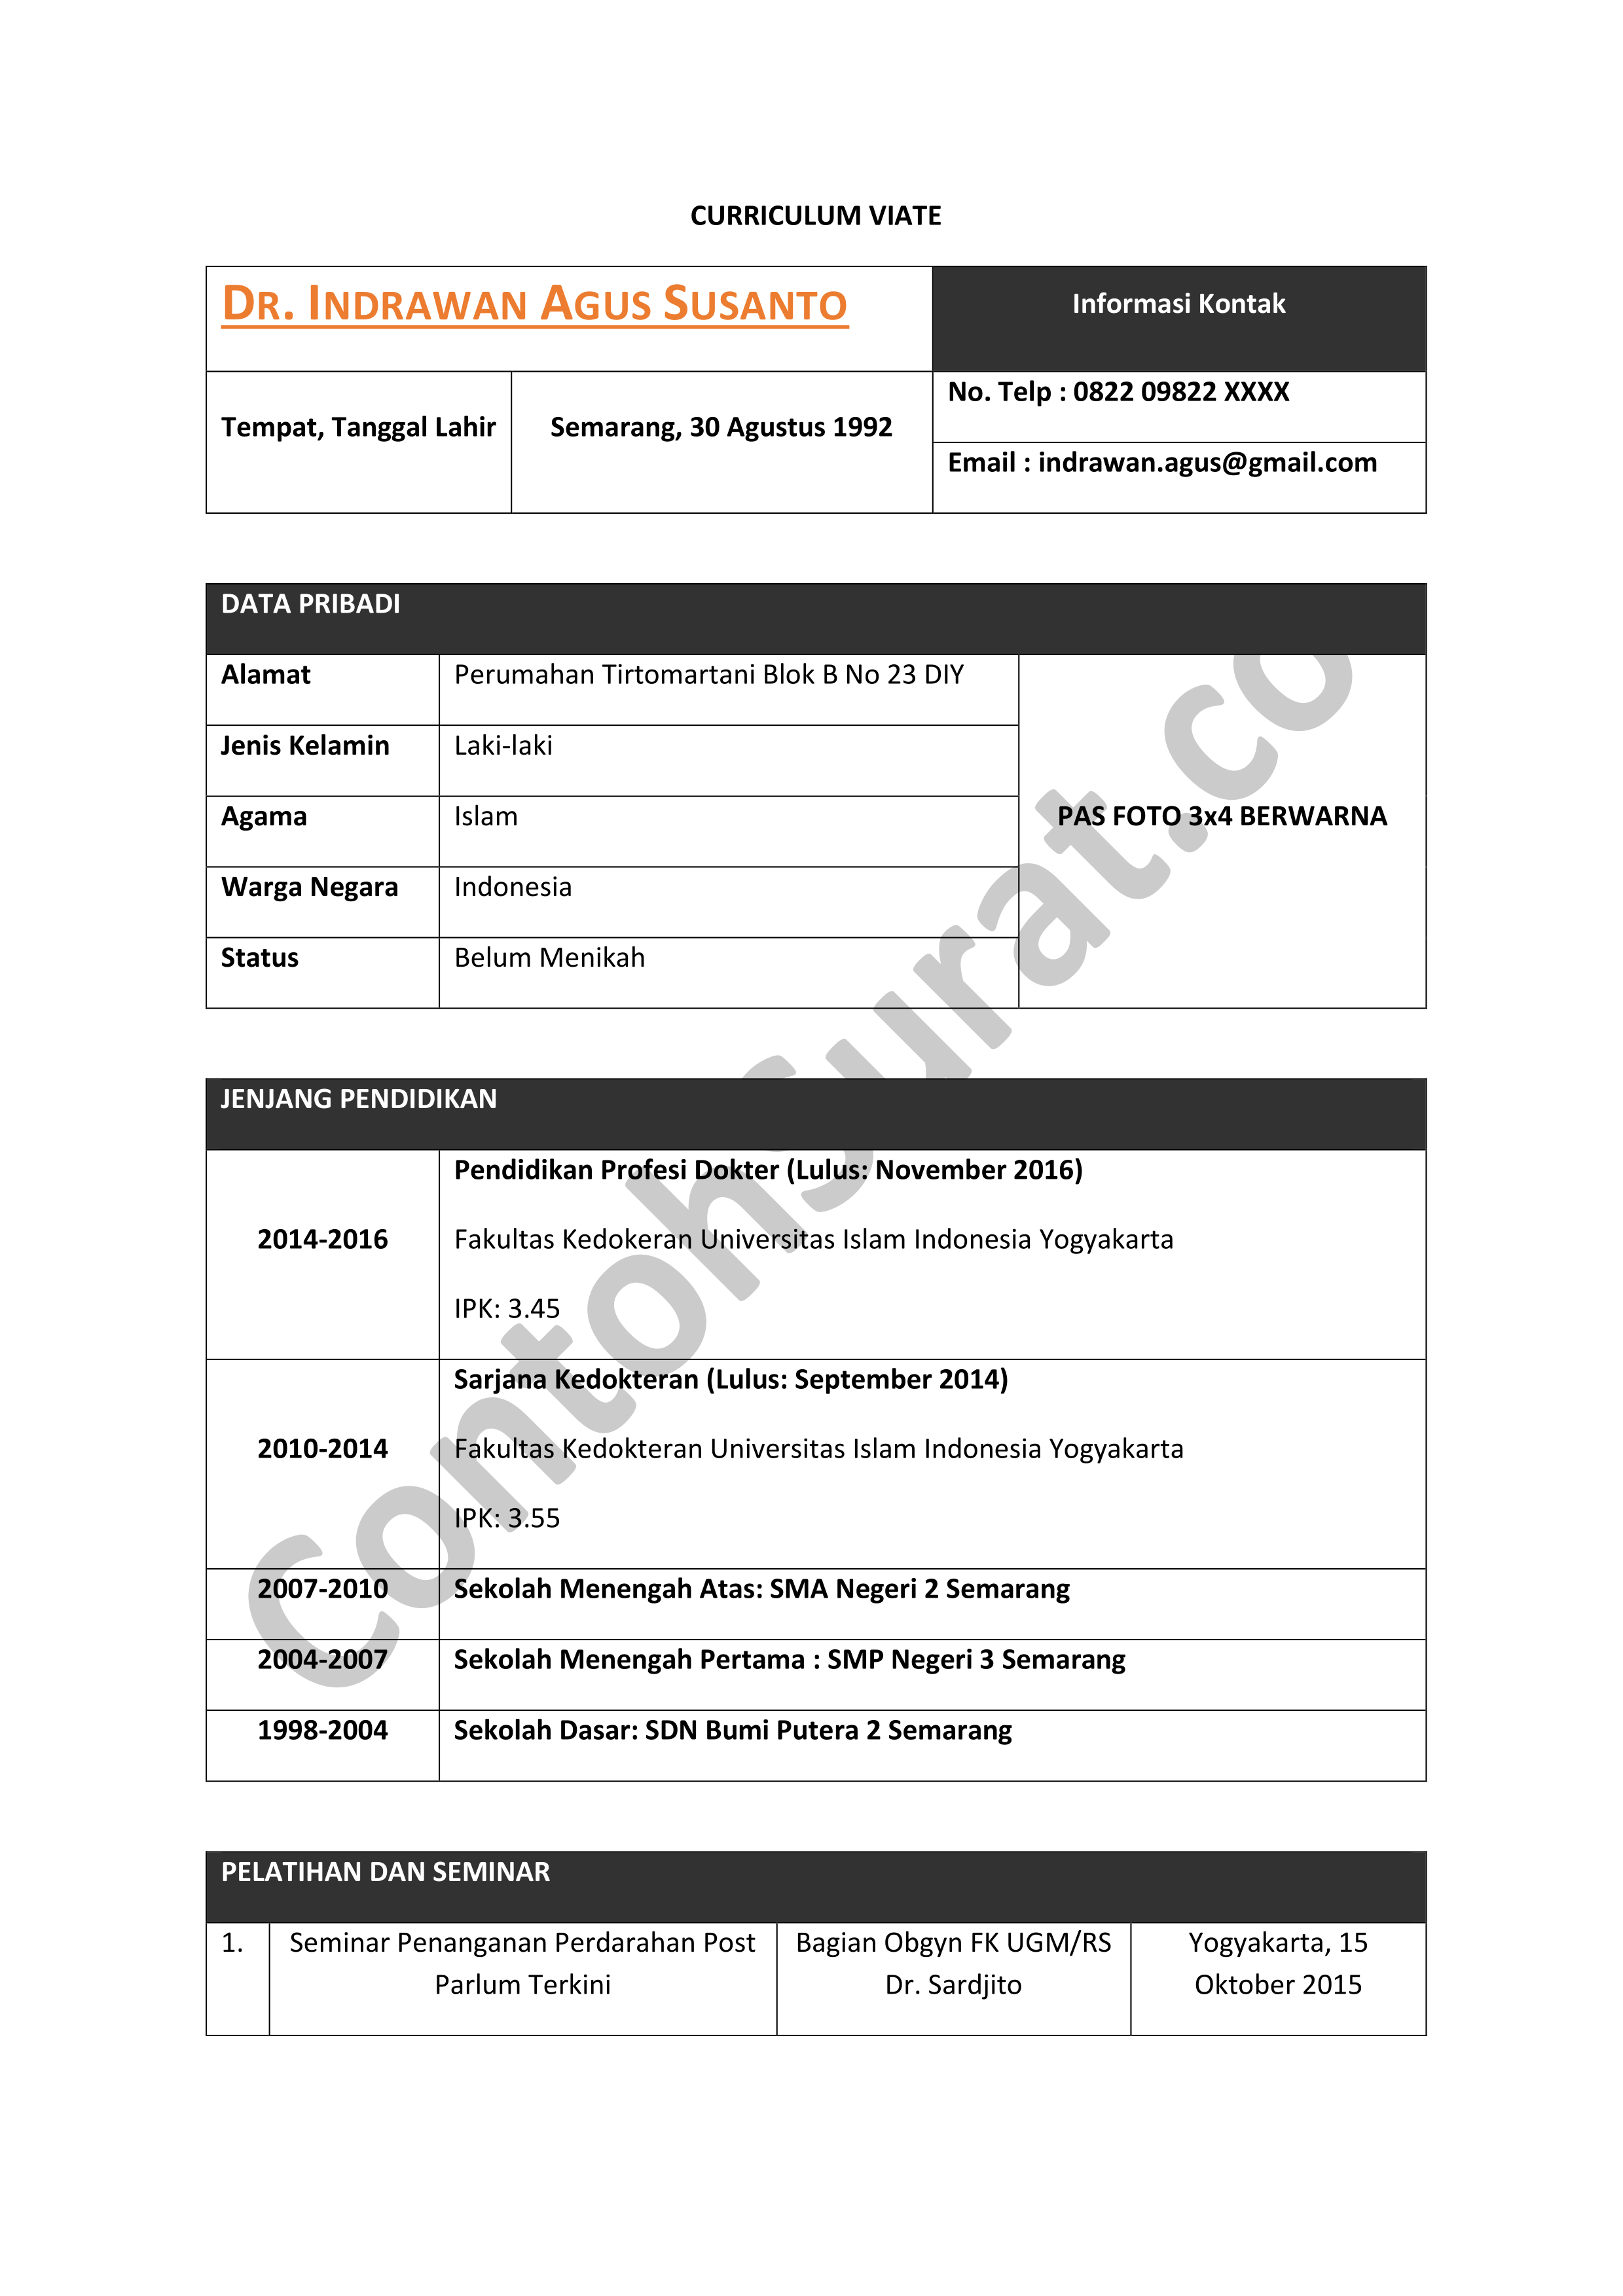 Contoh CV Daftar Riwayat Hidup Dokter Rumah Sakit